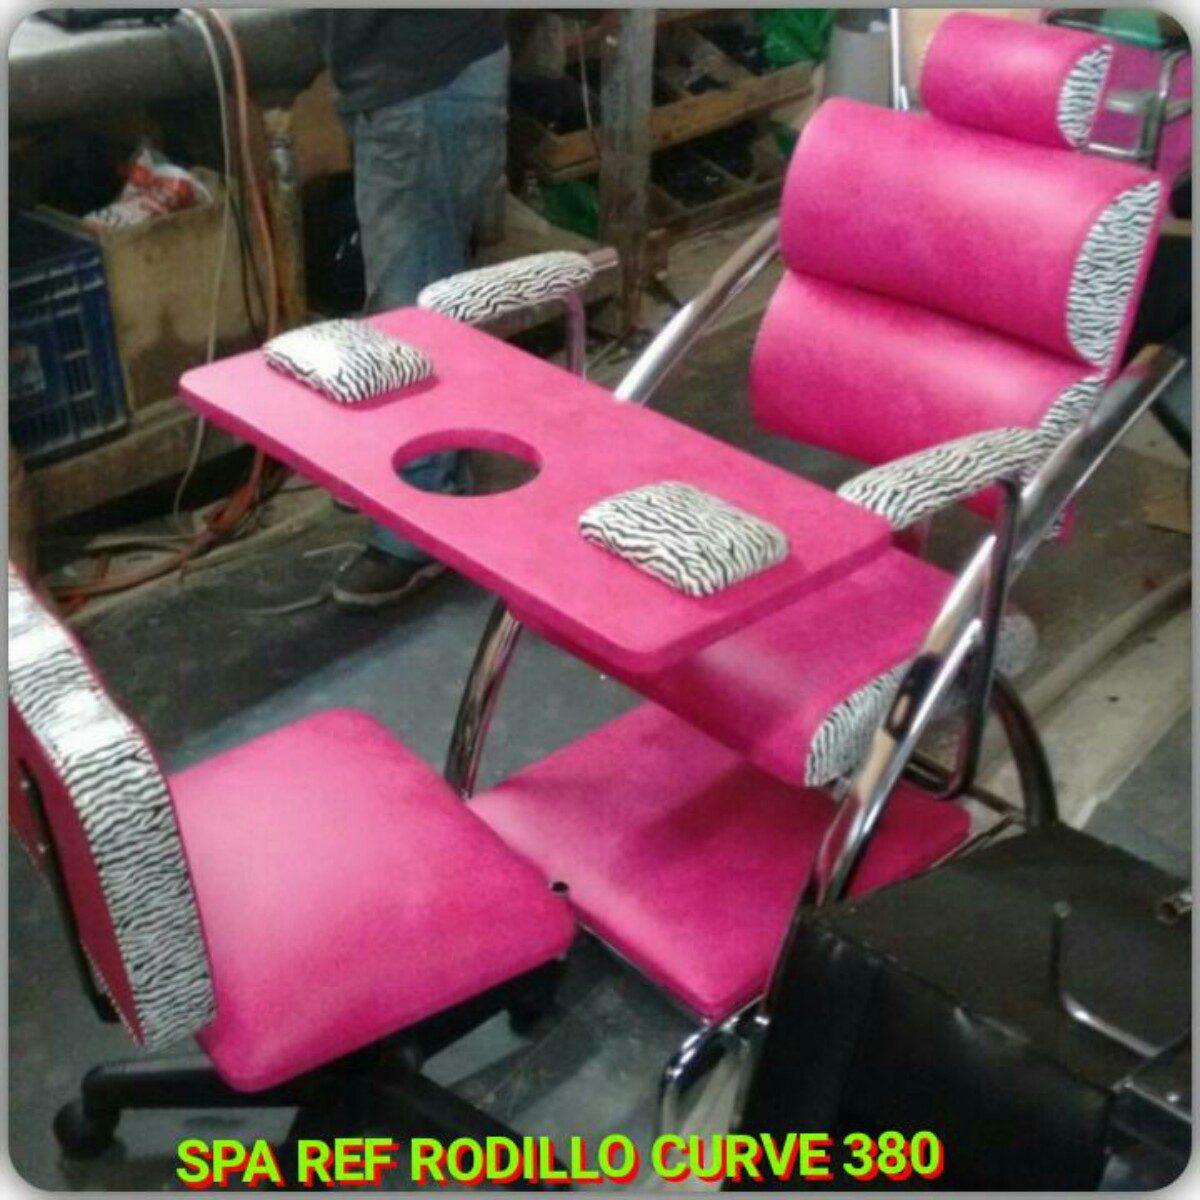 Muebles Peluqueria Spa De Uas Manicure Y Pedicure   350